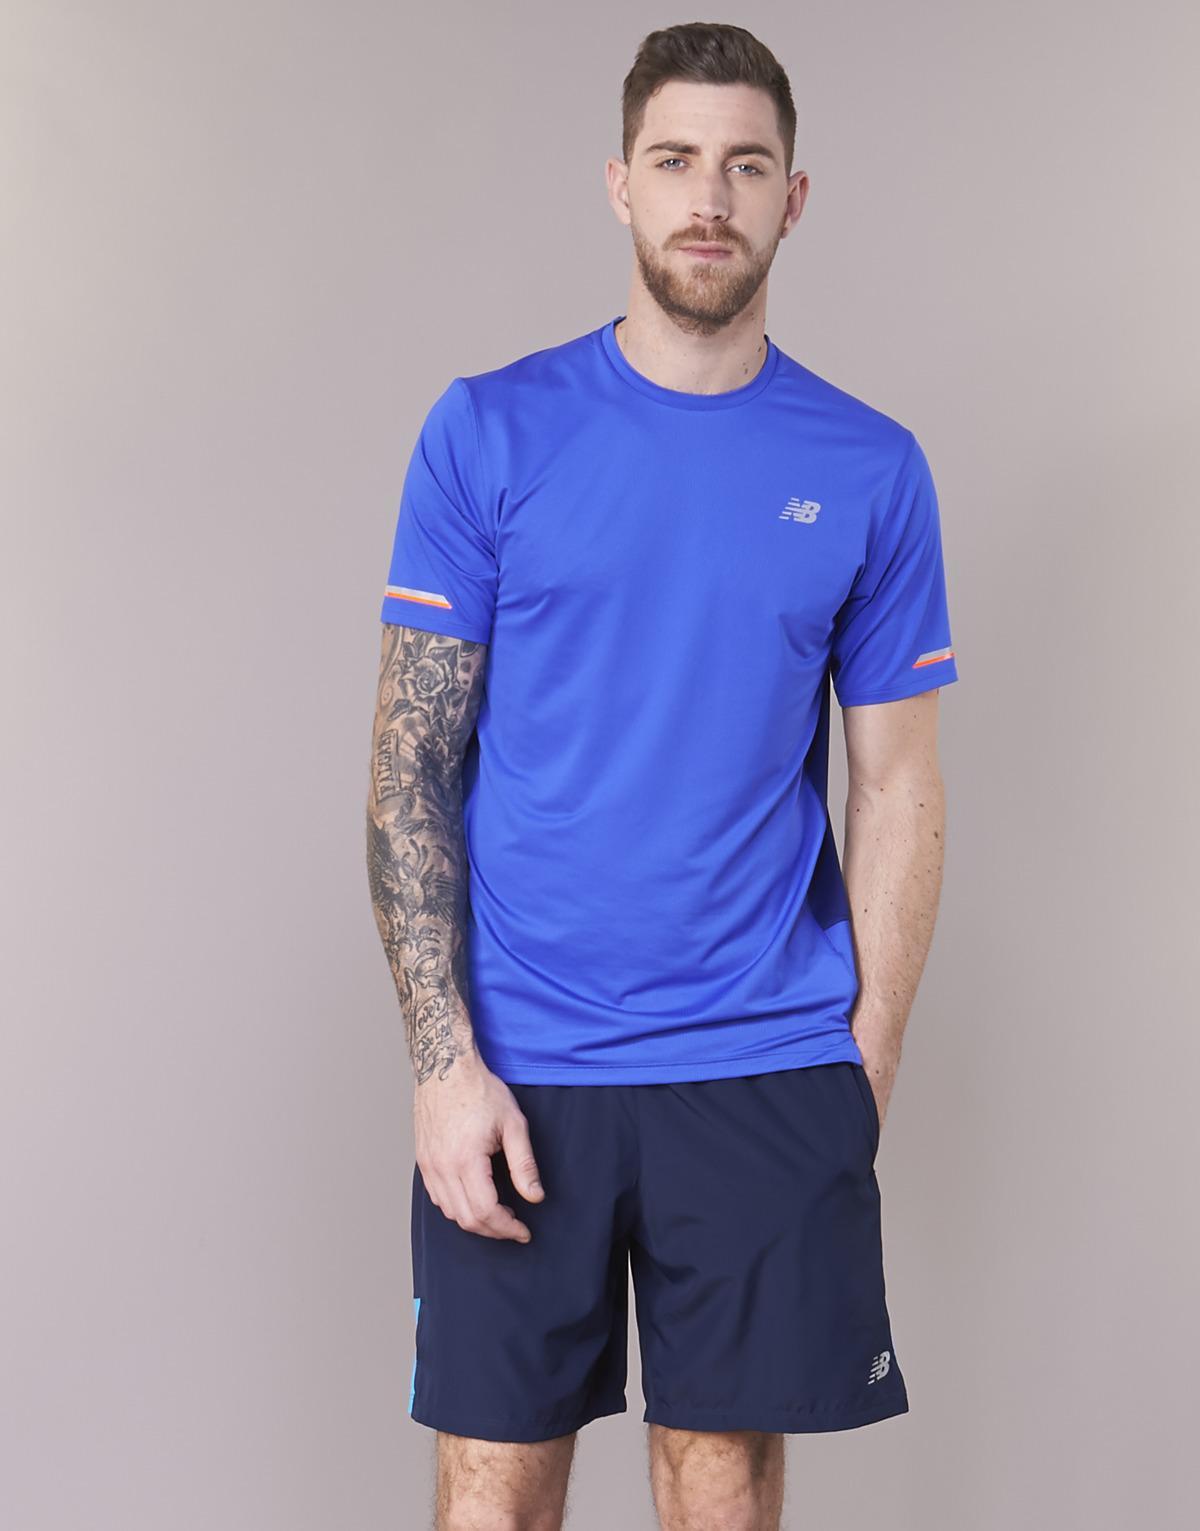 8470d17fcbf68 New Balance Nb Ice Tee Men's T Shirt In Blue in Blue for Men - Lyst